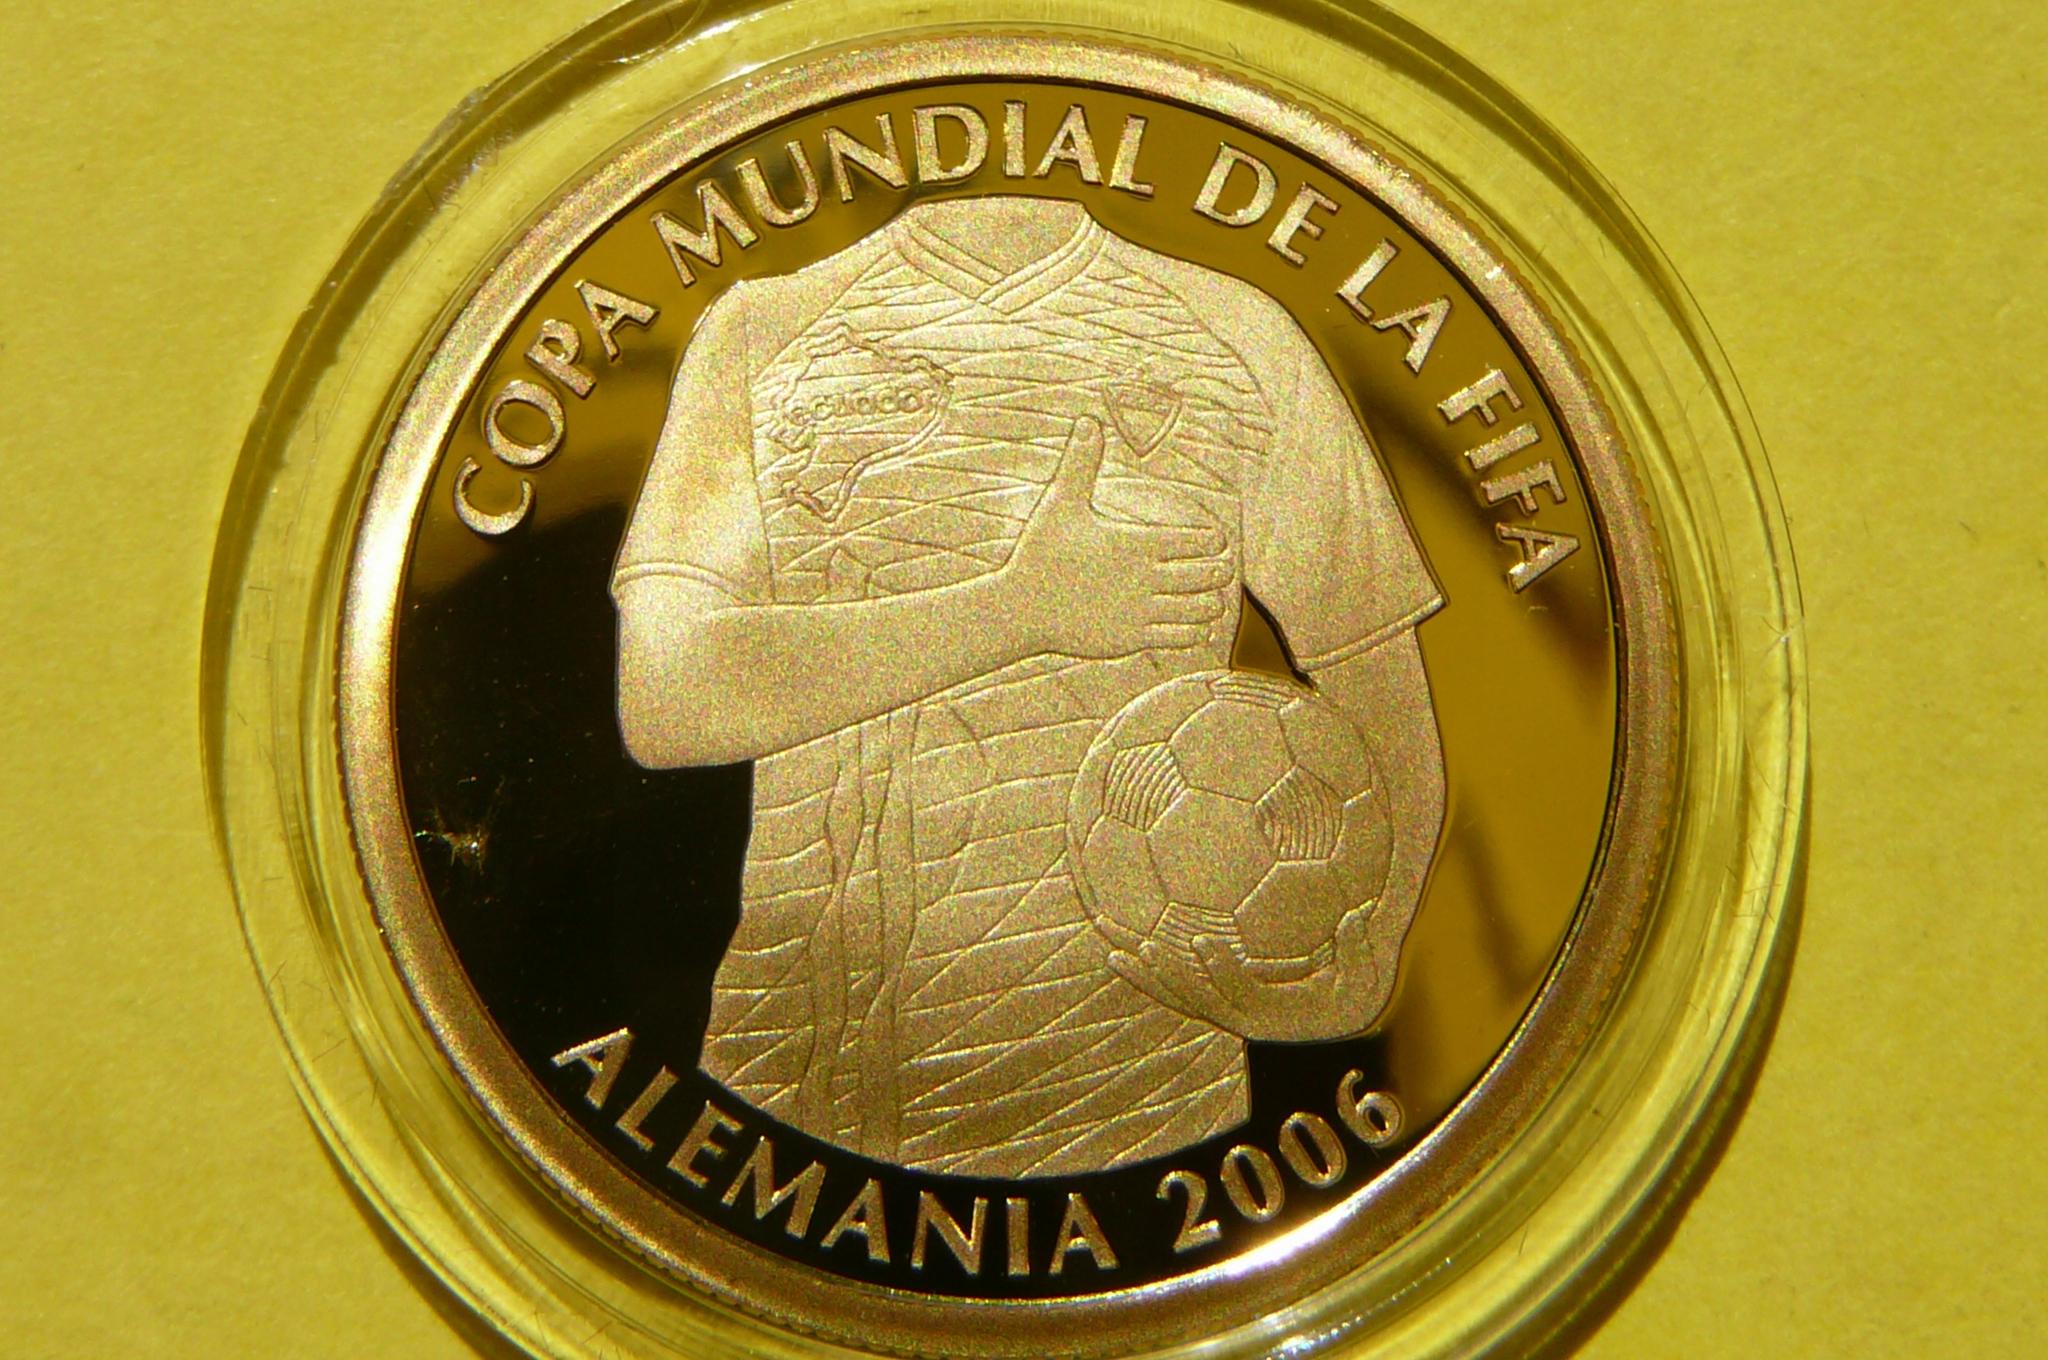 Sucre Ekwador 2006 Fifa World Cup Au 999 6 8g Cer 9367479429 Allegro Pl